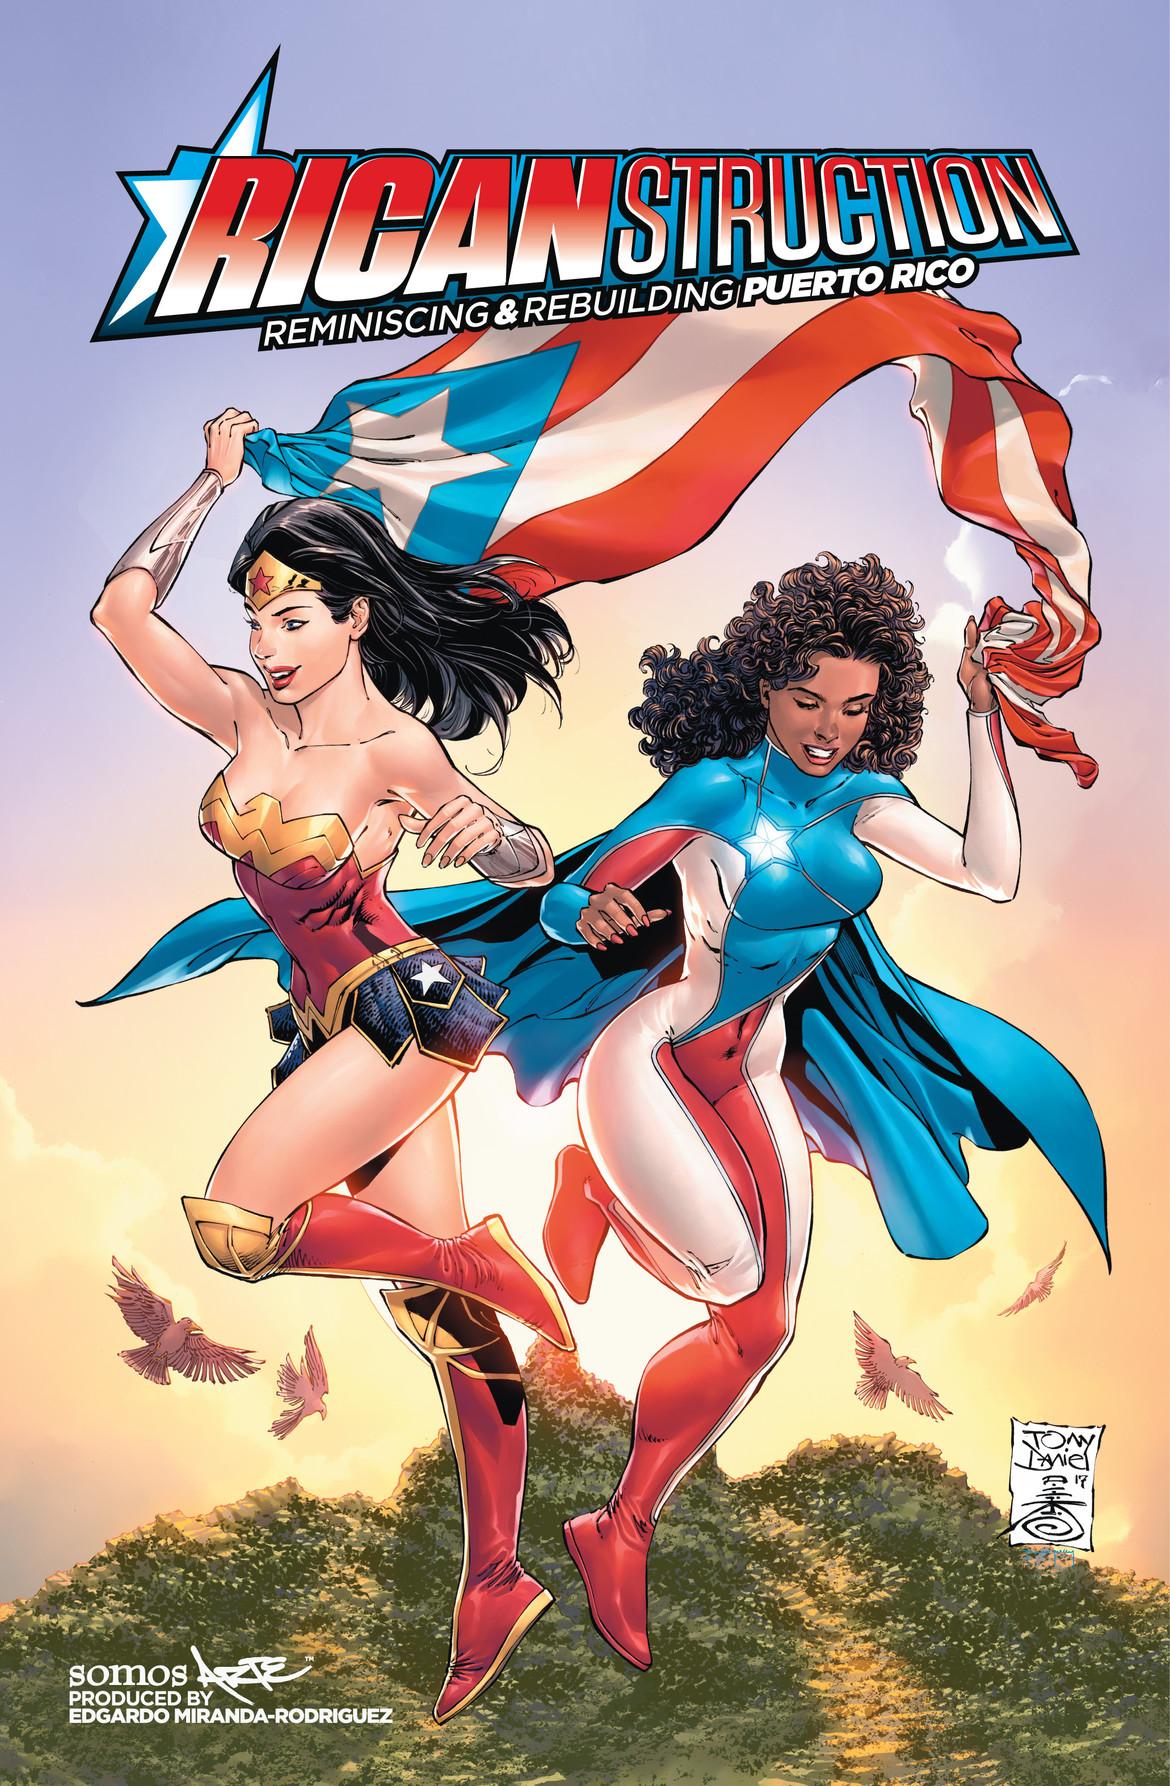 Ricanstruction, DC Comics, Edgardo Miranda-Rodriguez, Puerto Rico